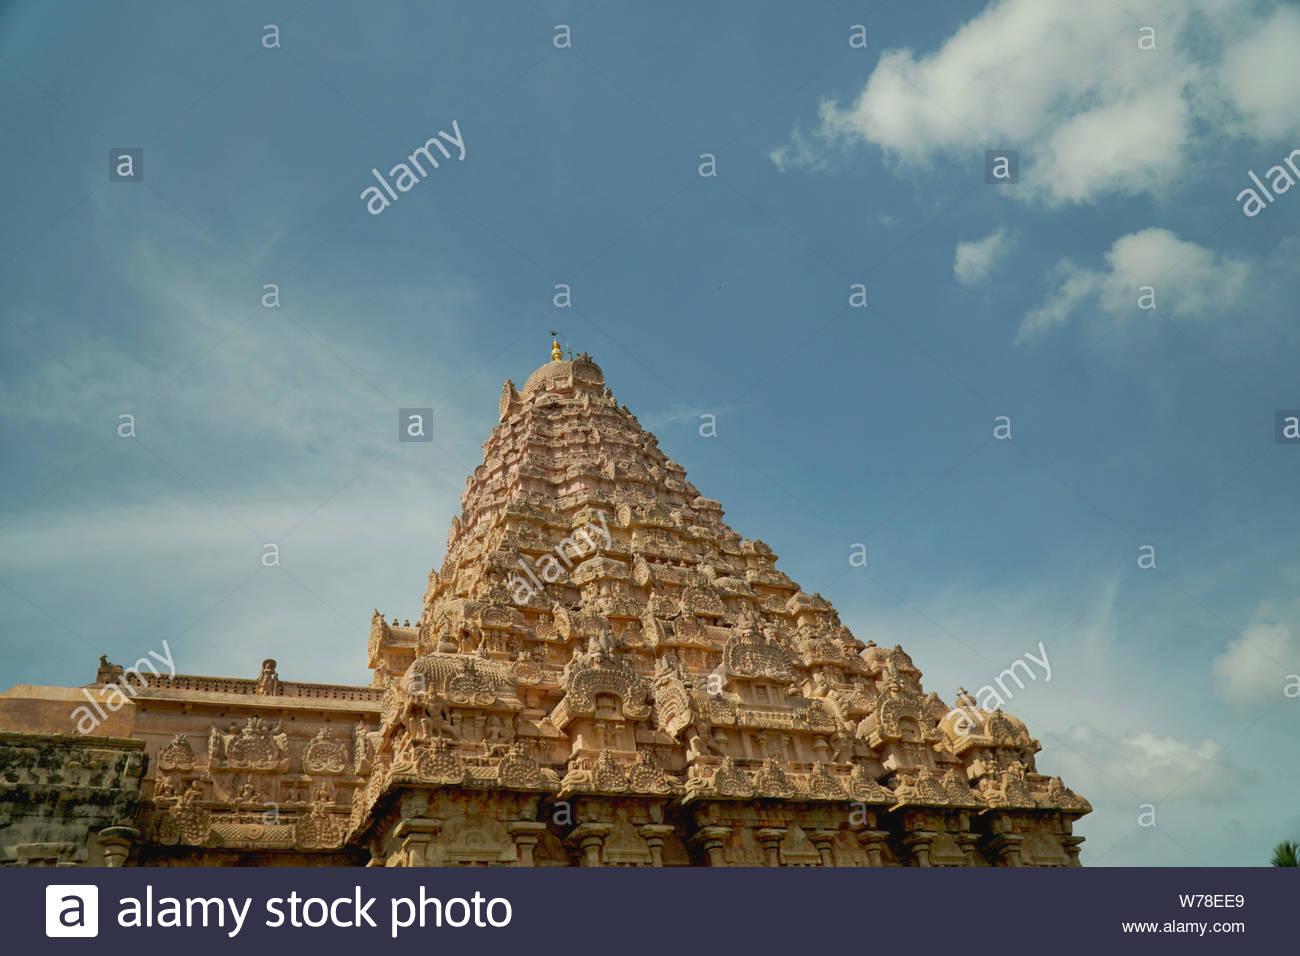 Gangaikonda Cholapuram is a town located in Jayankondam